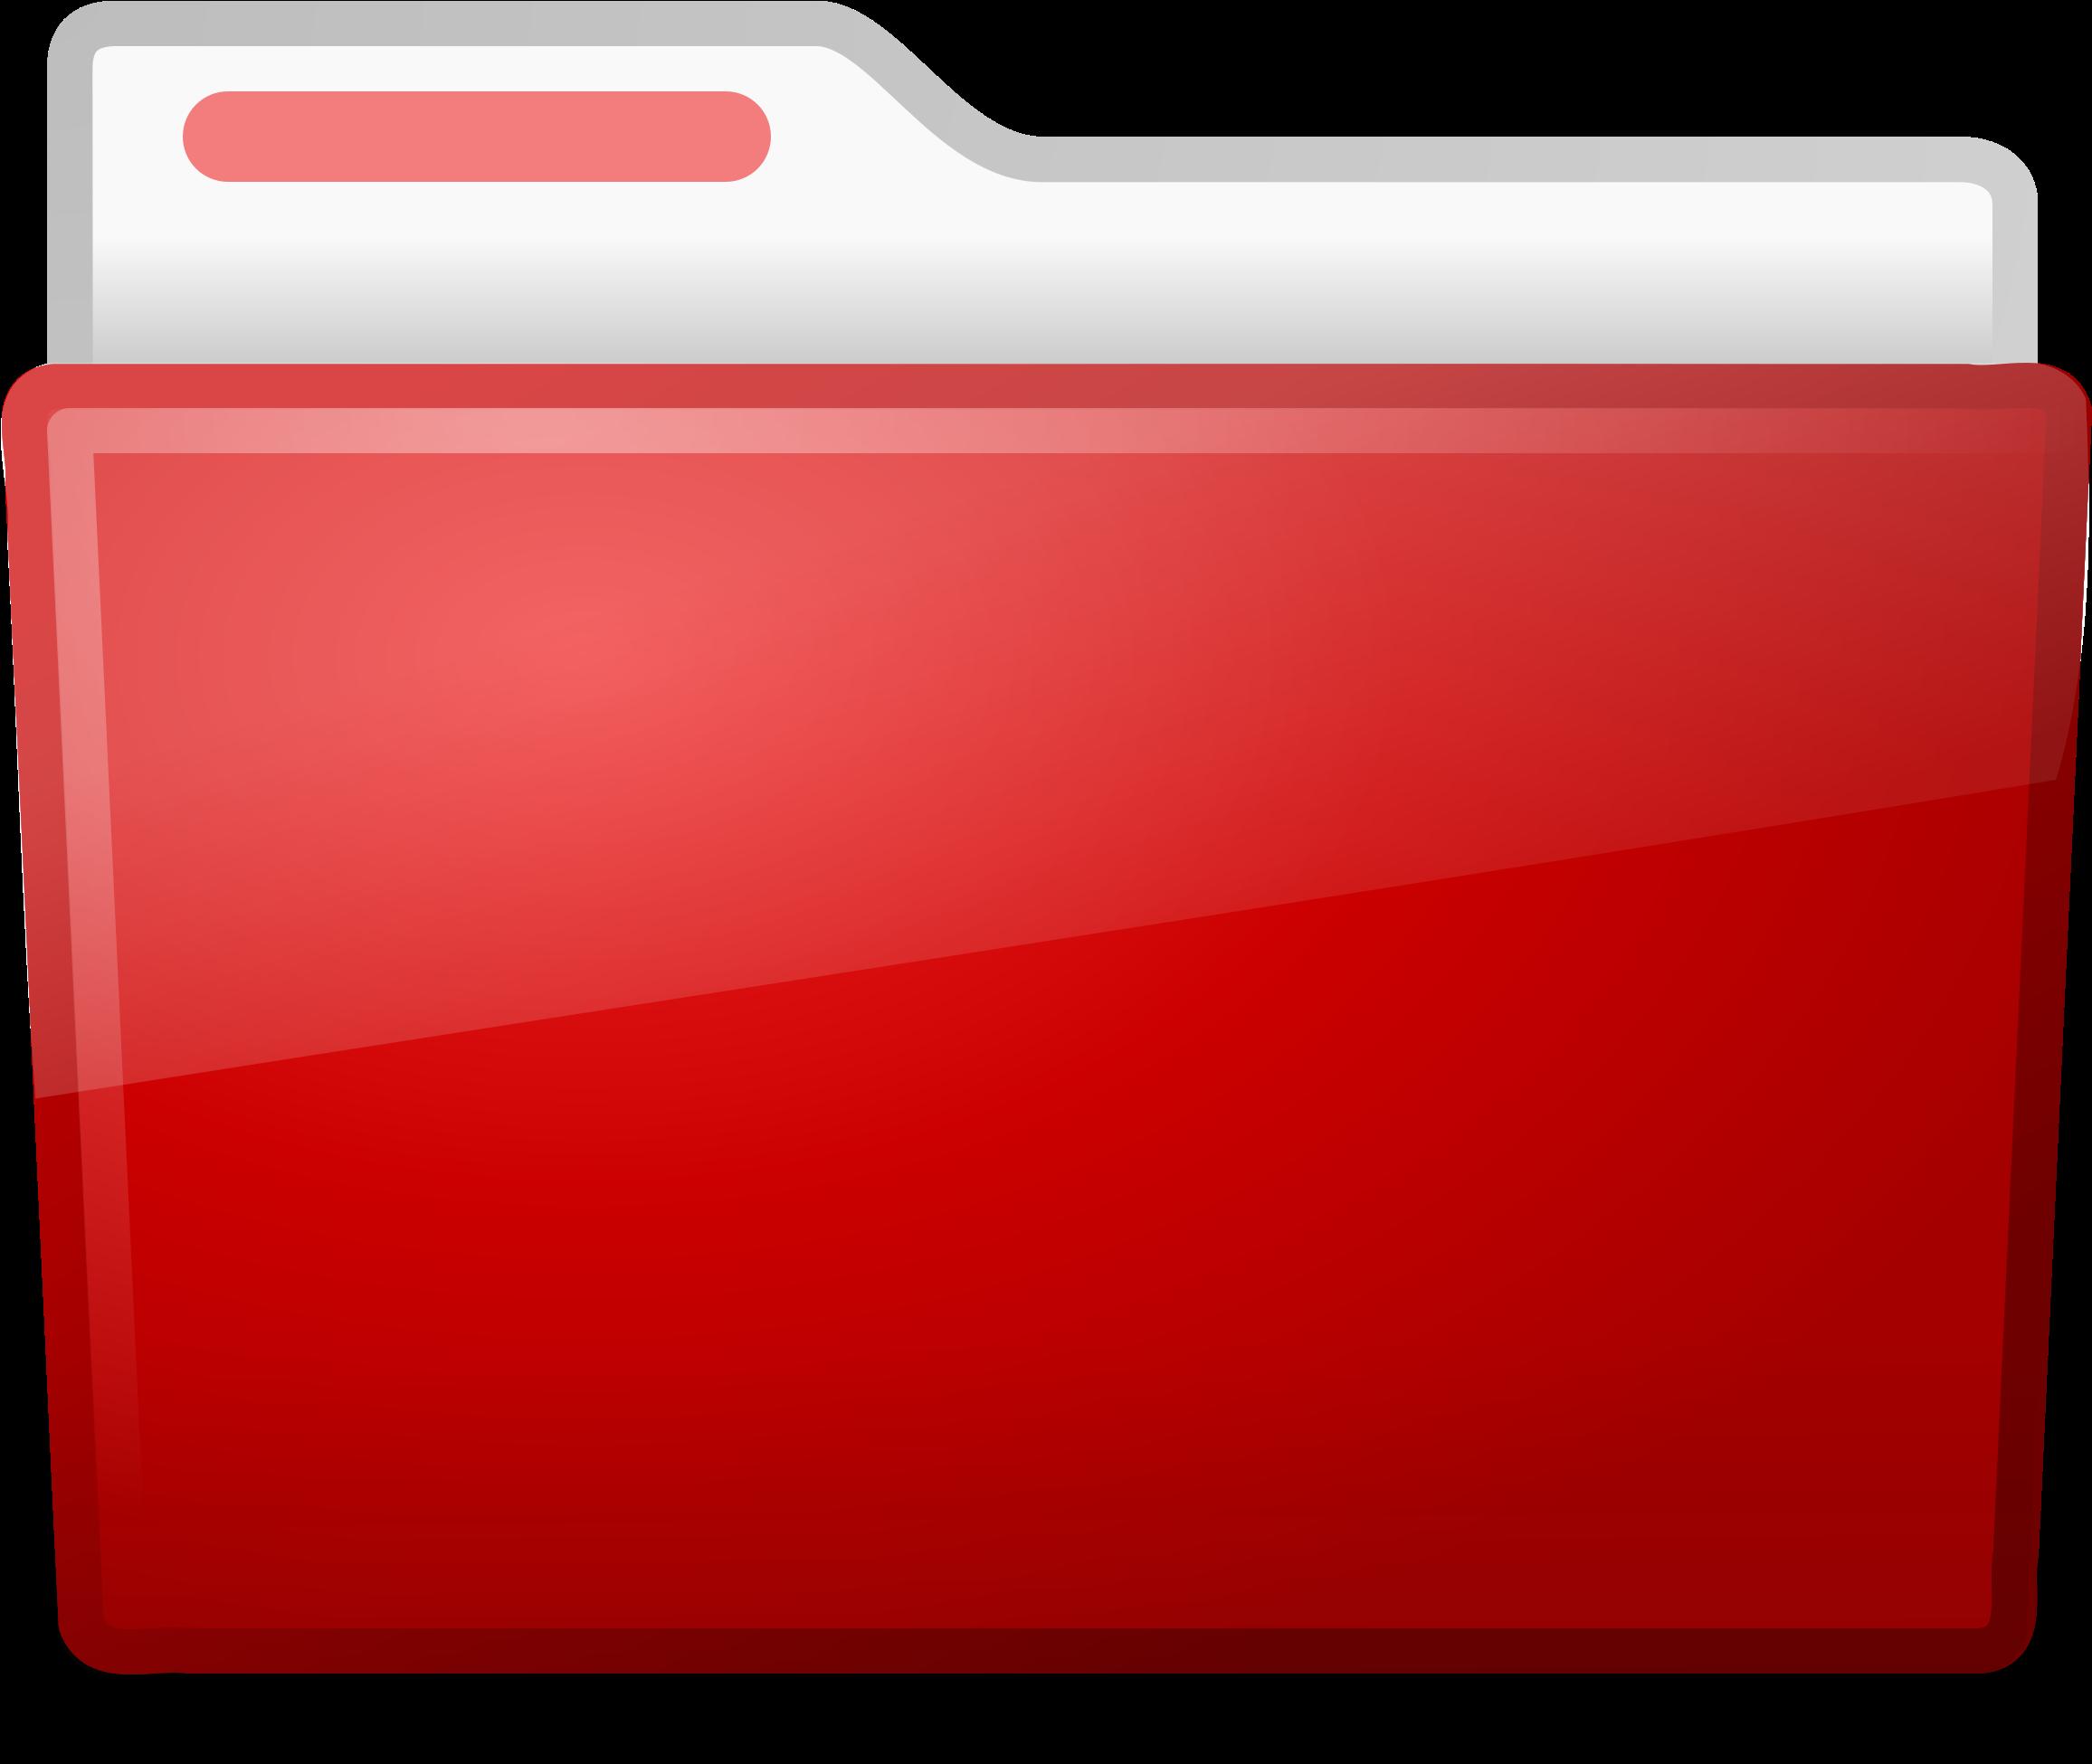 Arquivo clipart clip transparent Red File Folder Vector Clipart Image - Imagem De Arquivo Png ... clip transparent